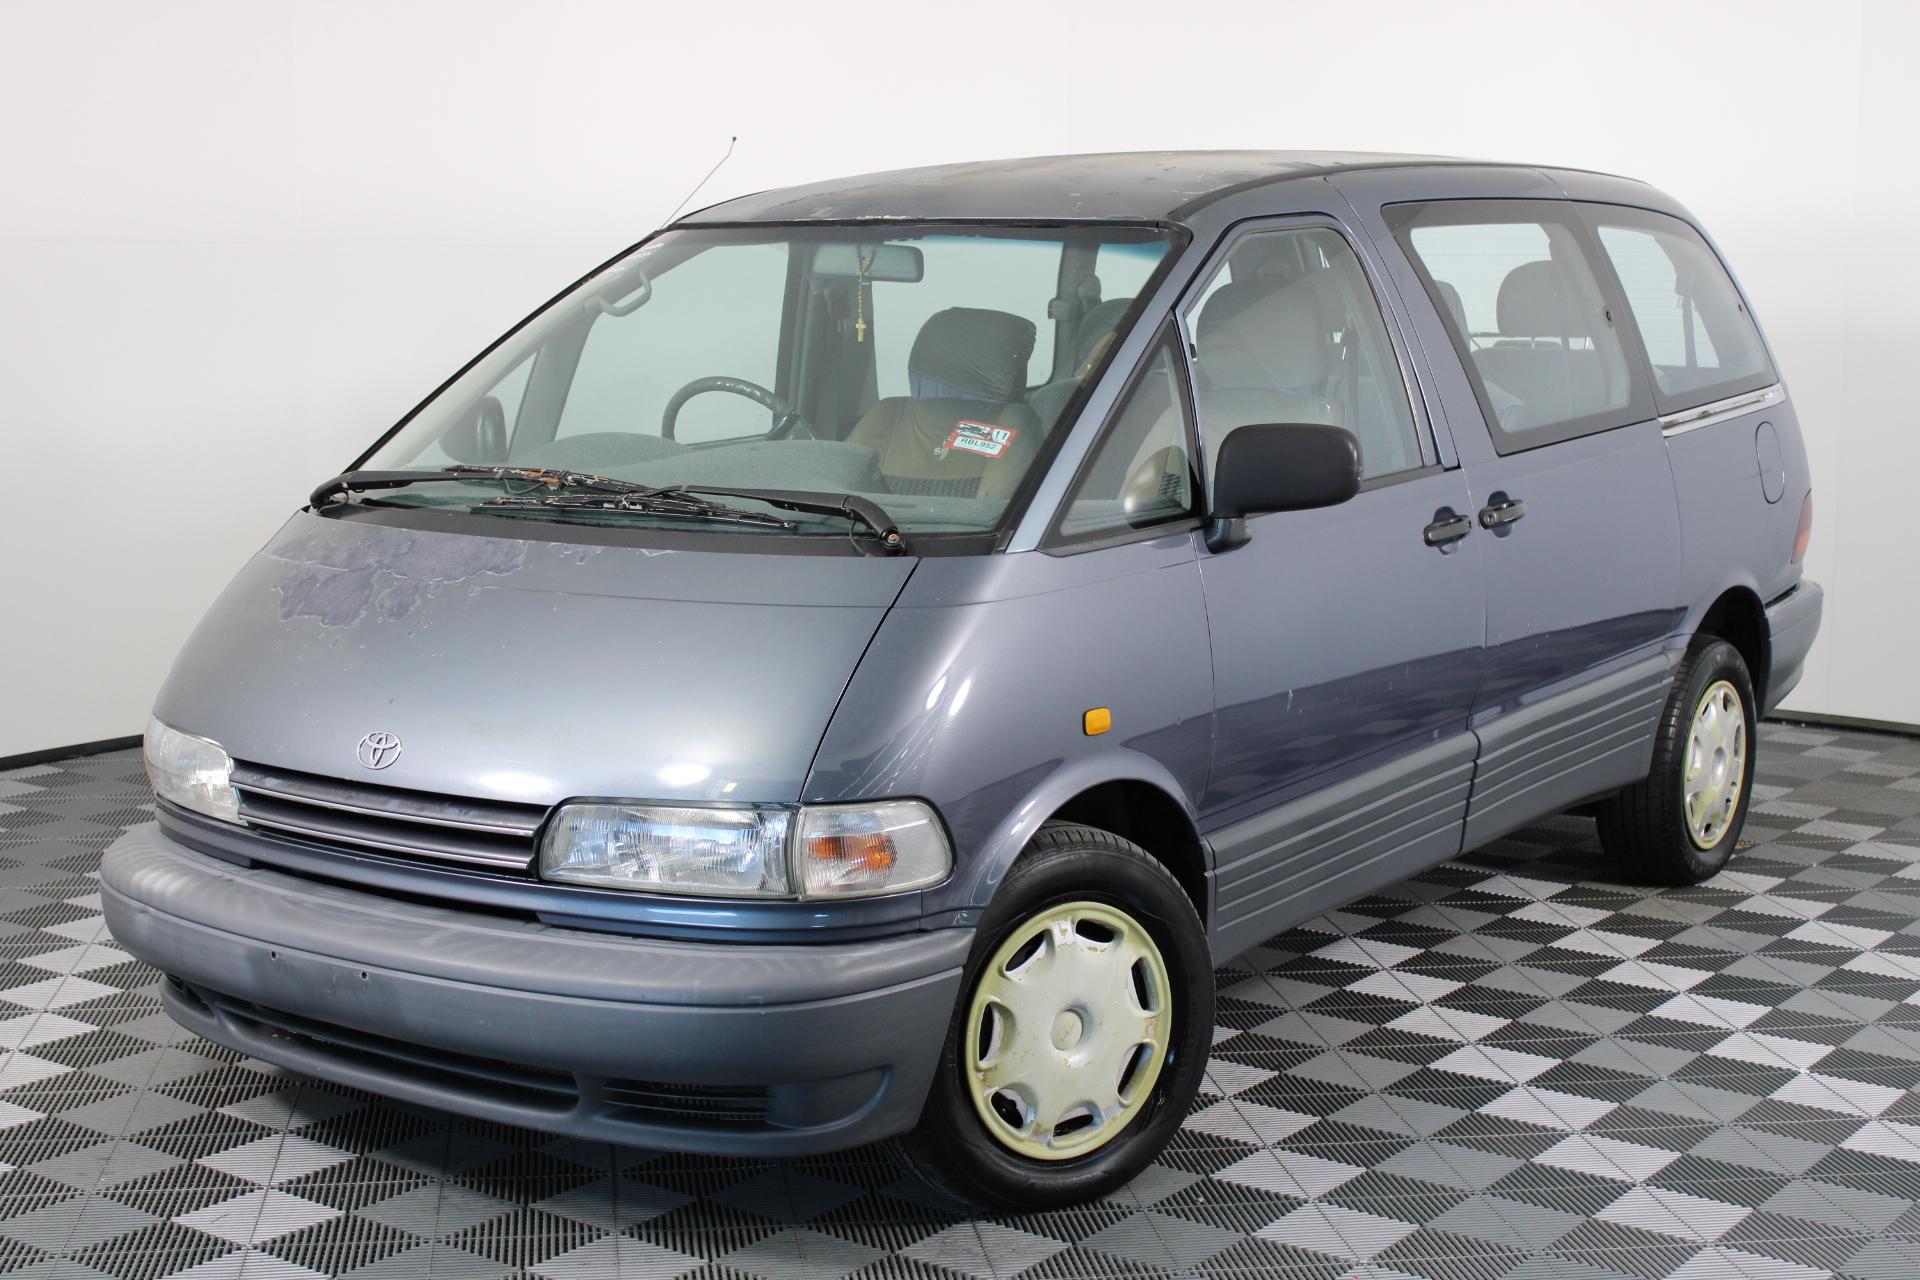 1993 Toyota Tarago GLI TCR10 Automatic 8 Seats People Mover